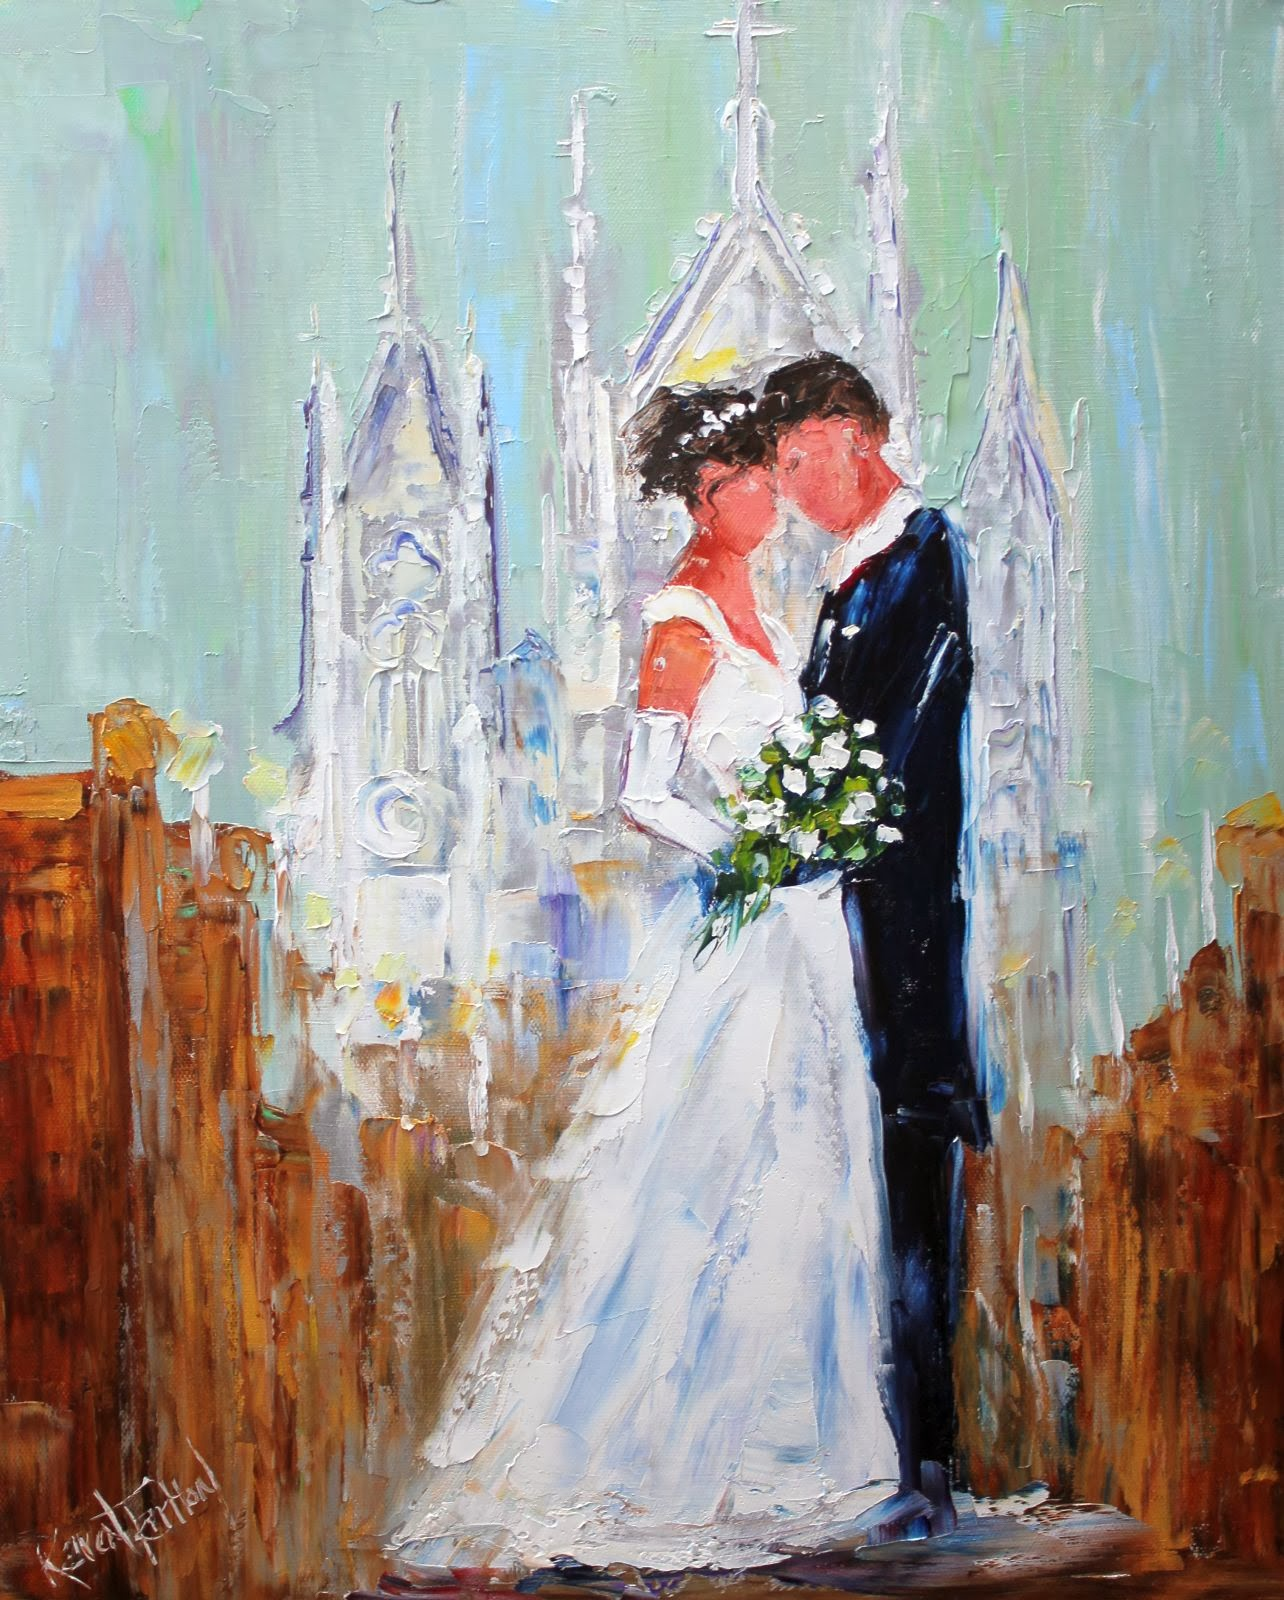 Karen Tarlton: Original oil painting Wedding custom painting by Karen Tarlton